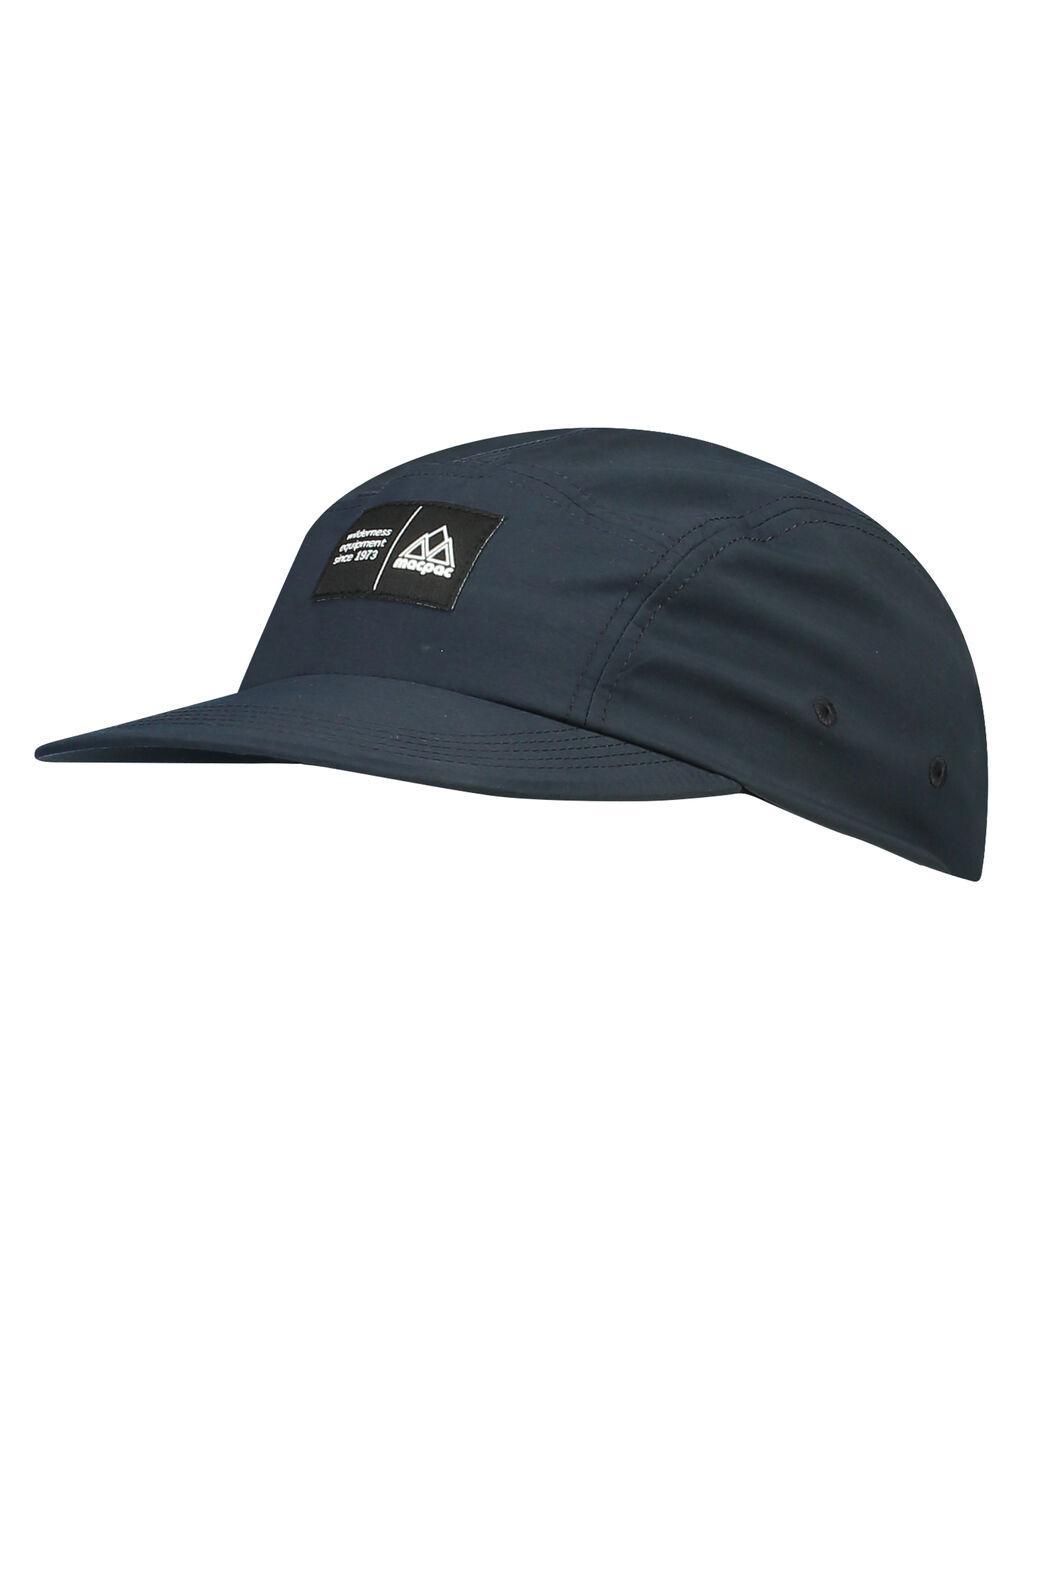 Macpac 5-Panel Hiker Cap, Carbon, hi-res